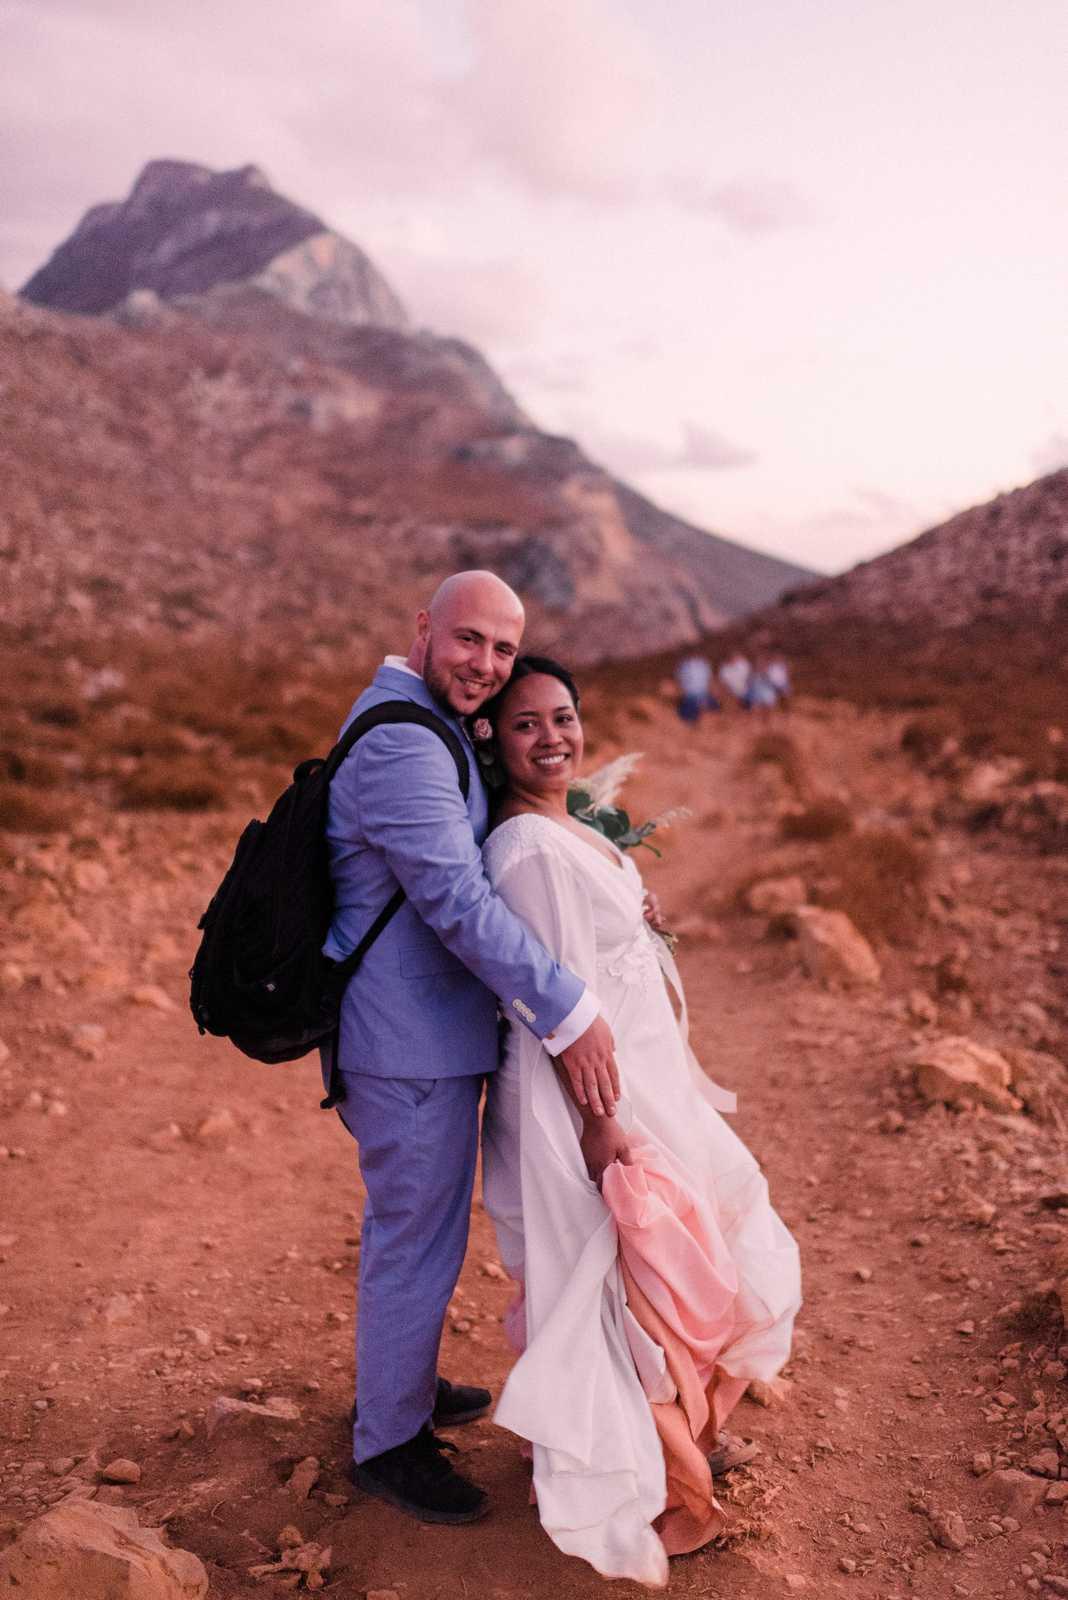 Hiking elopement adventure in Crete